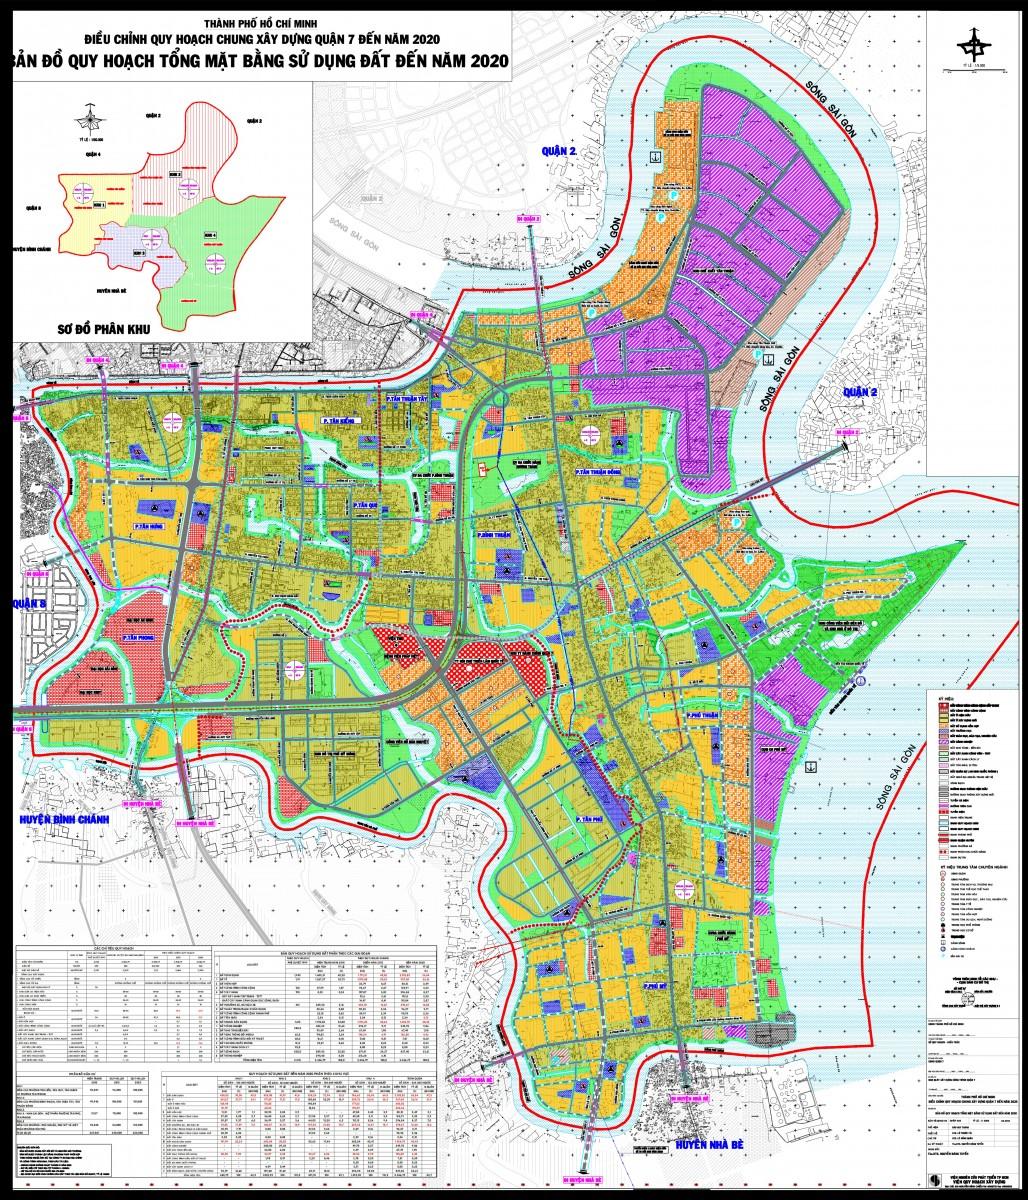 Bản đồ Quận 7 TPHCM